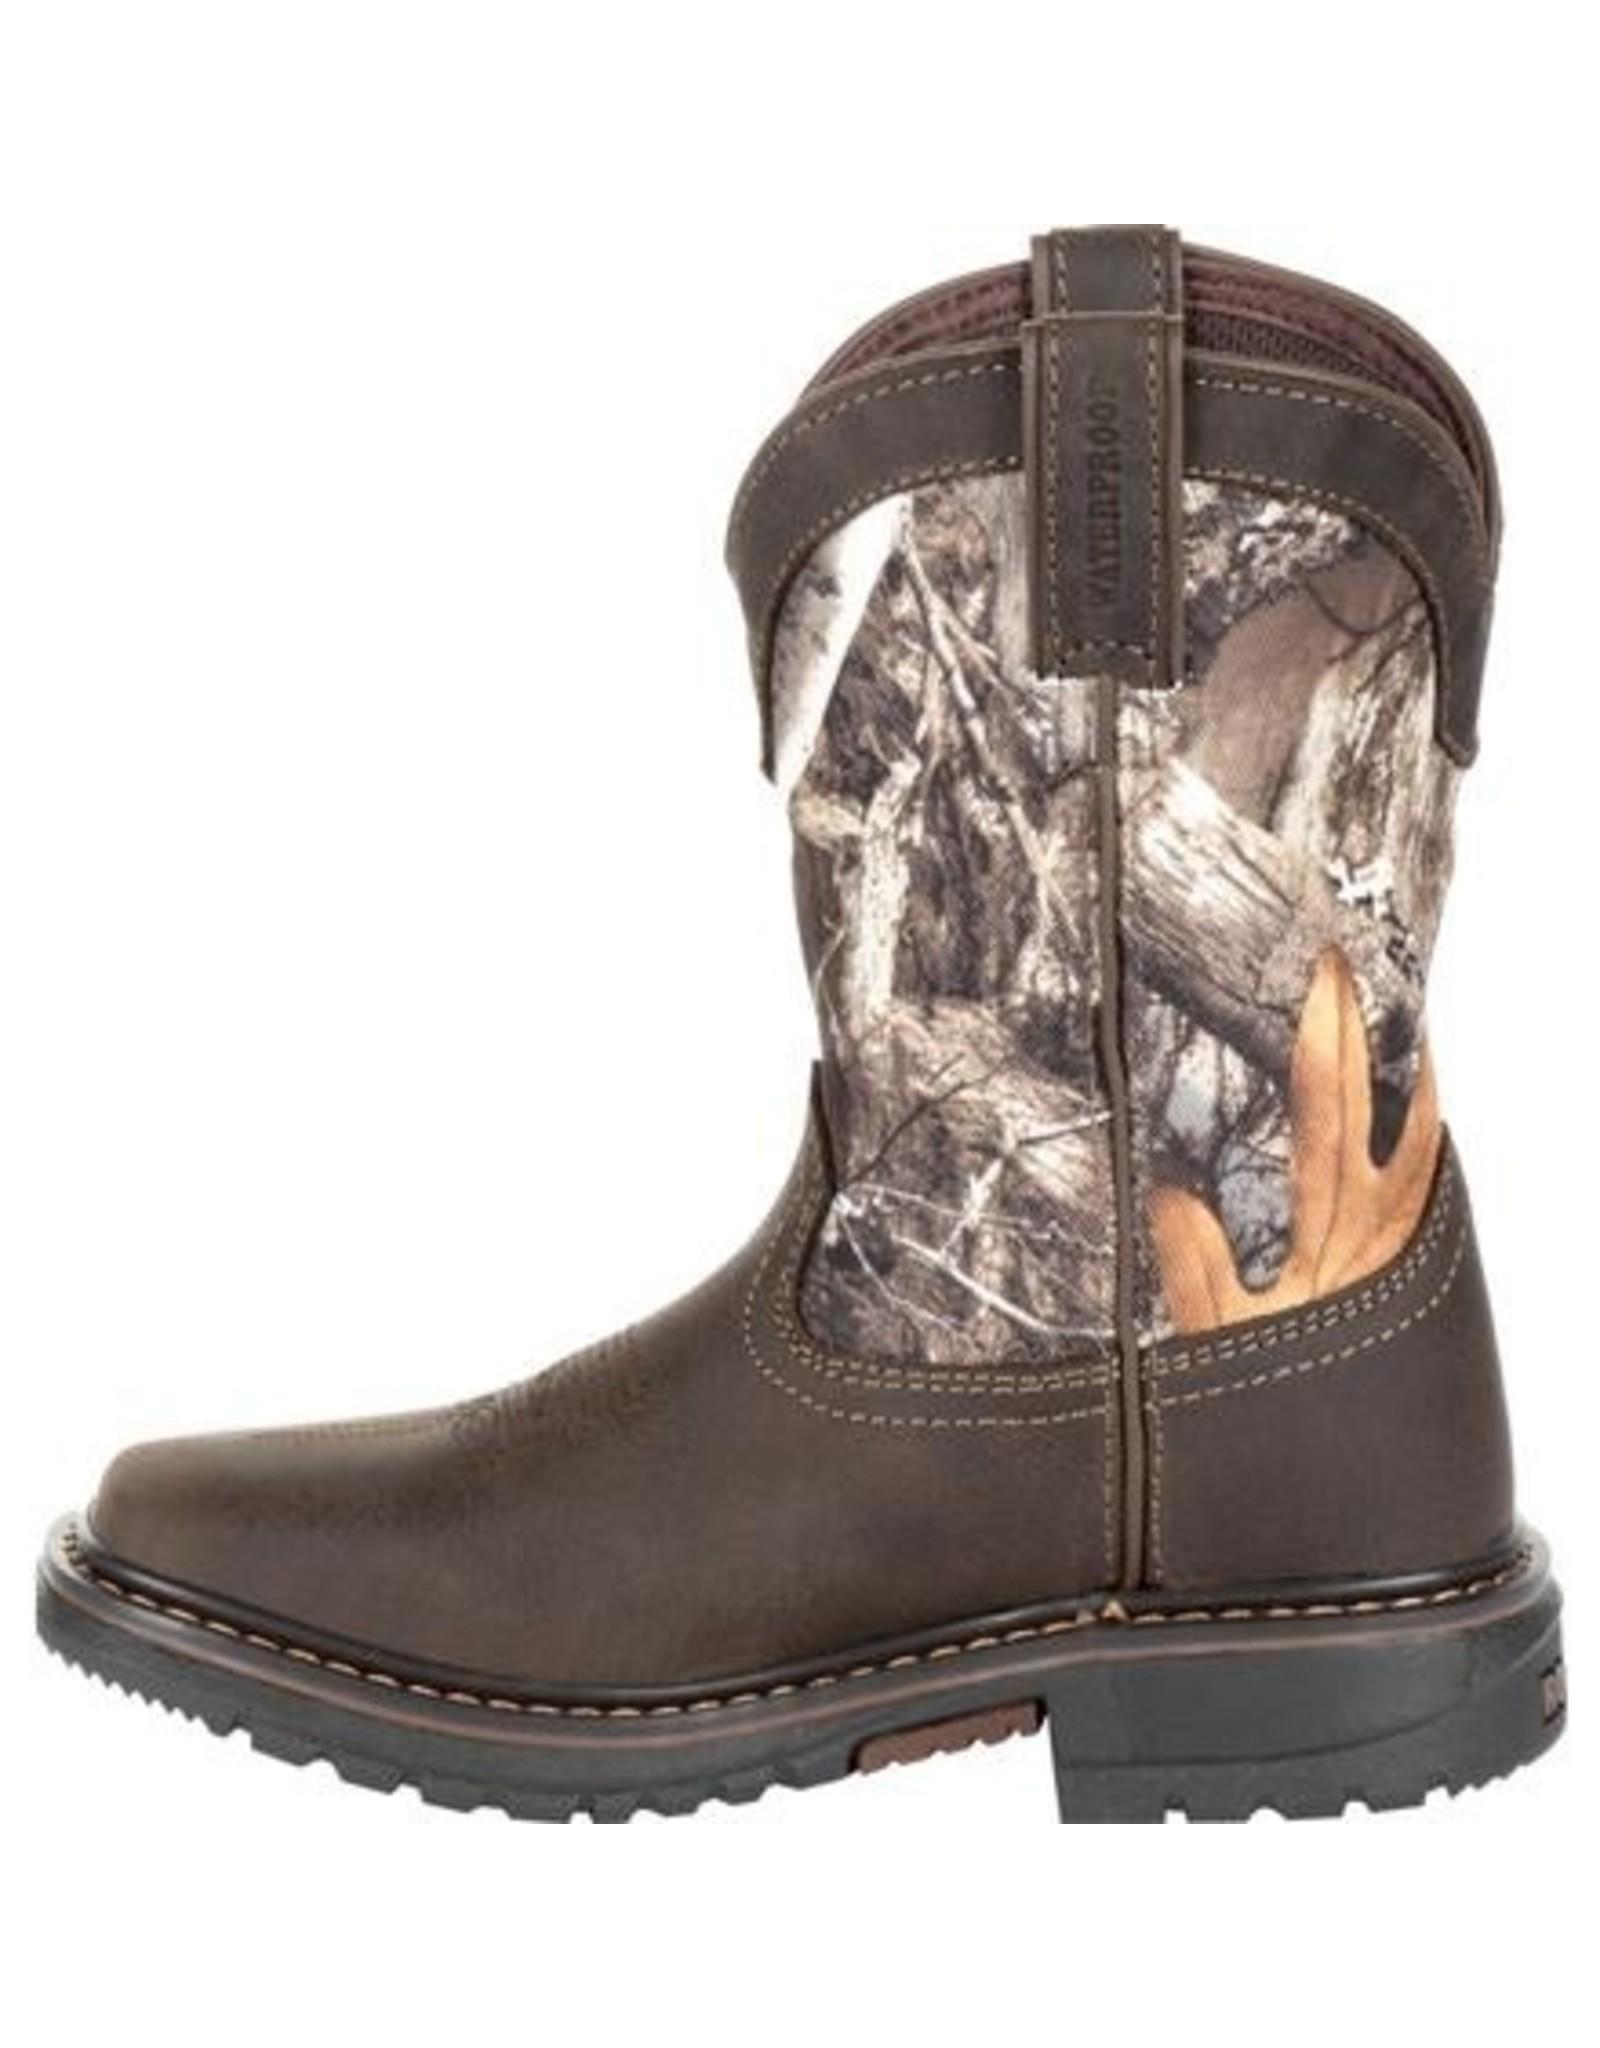 Boots-Children Rocky RKW0285C Realtree Original Ride Flx